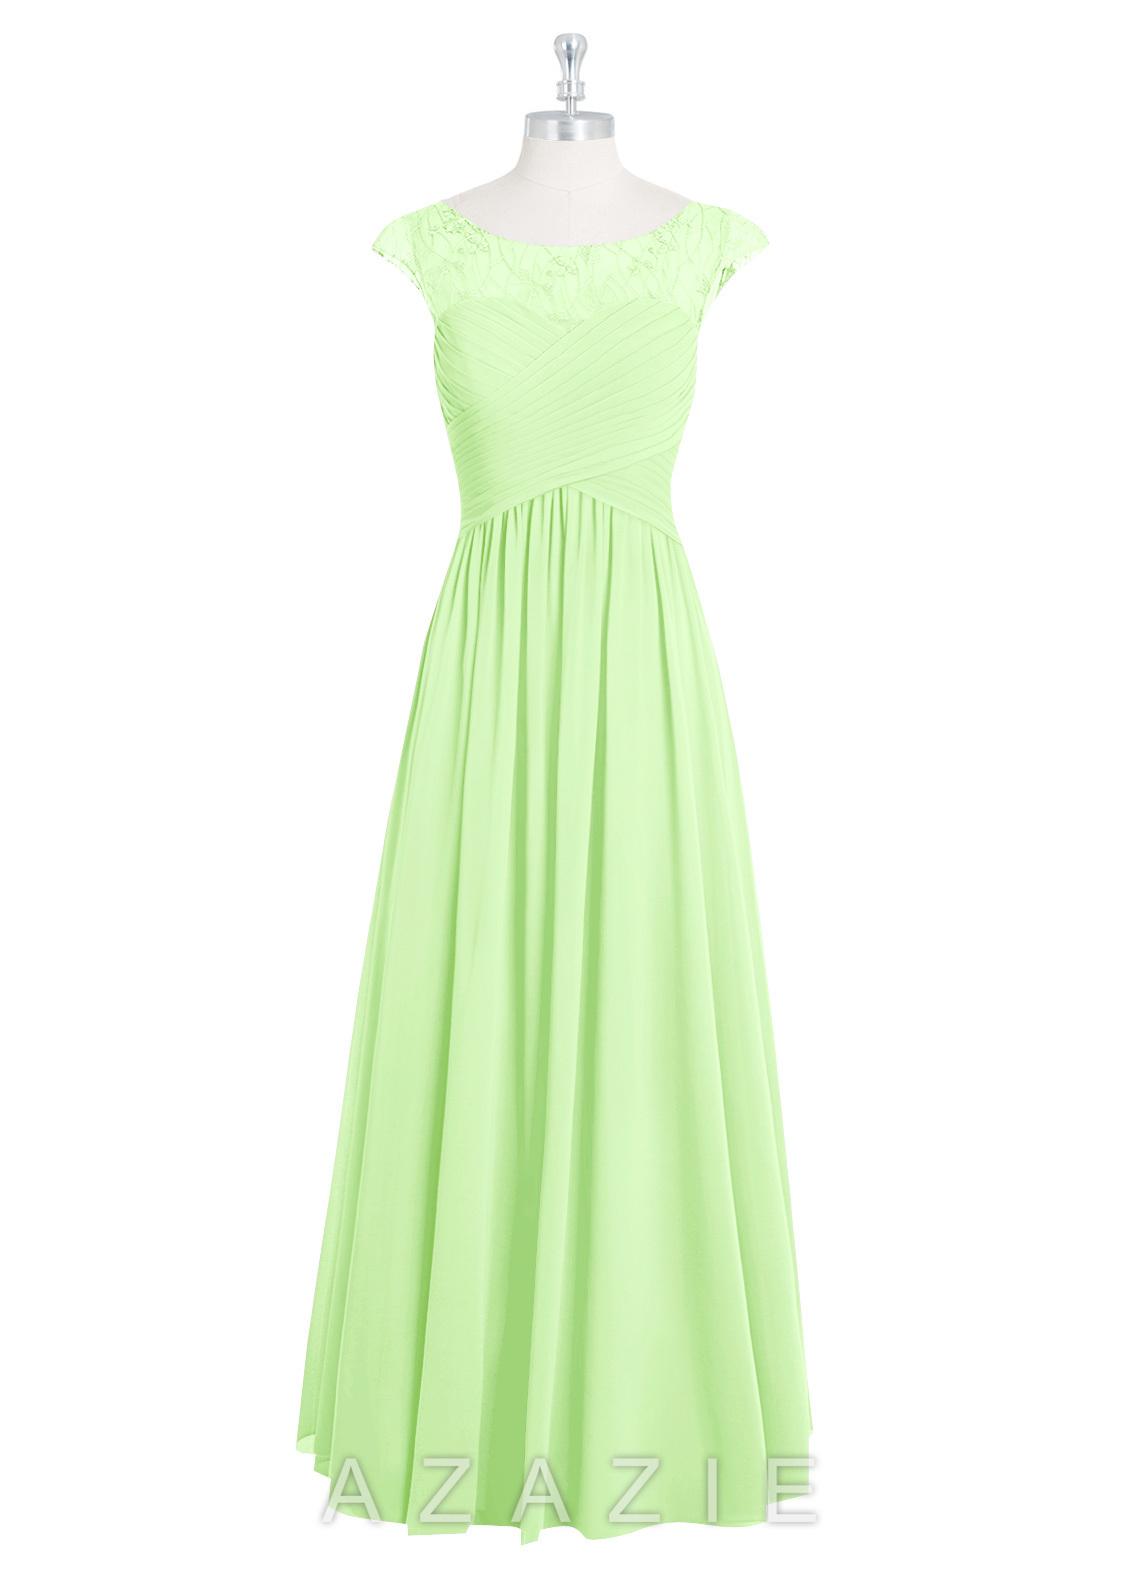 Azazie tobey bridesmaid dress azazie color sage ombrellifo Choice Image